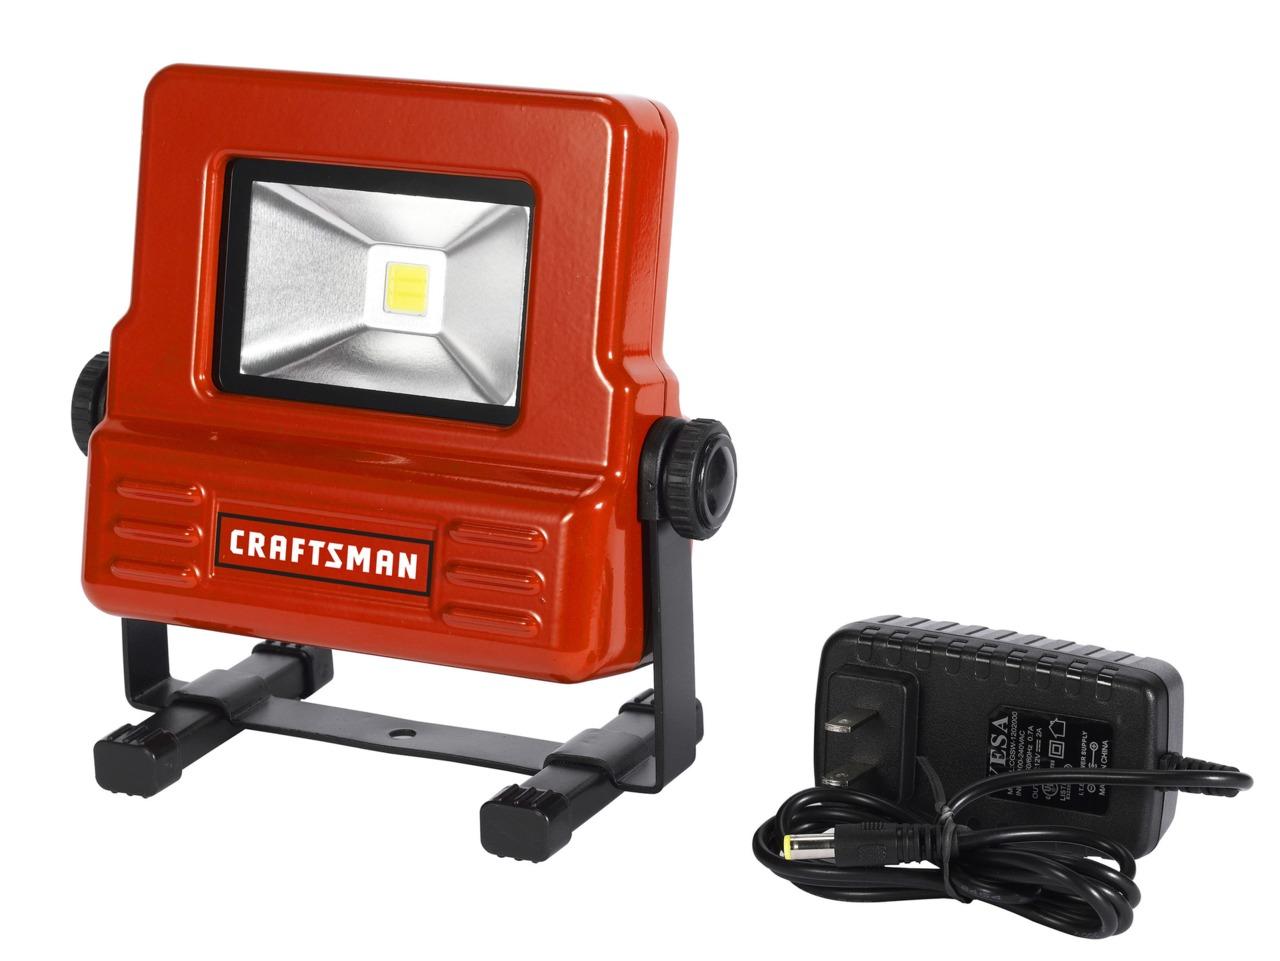 Craftsman 20 Watt Rechargeable Led Light 56991eca70cee